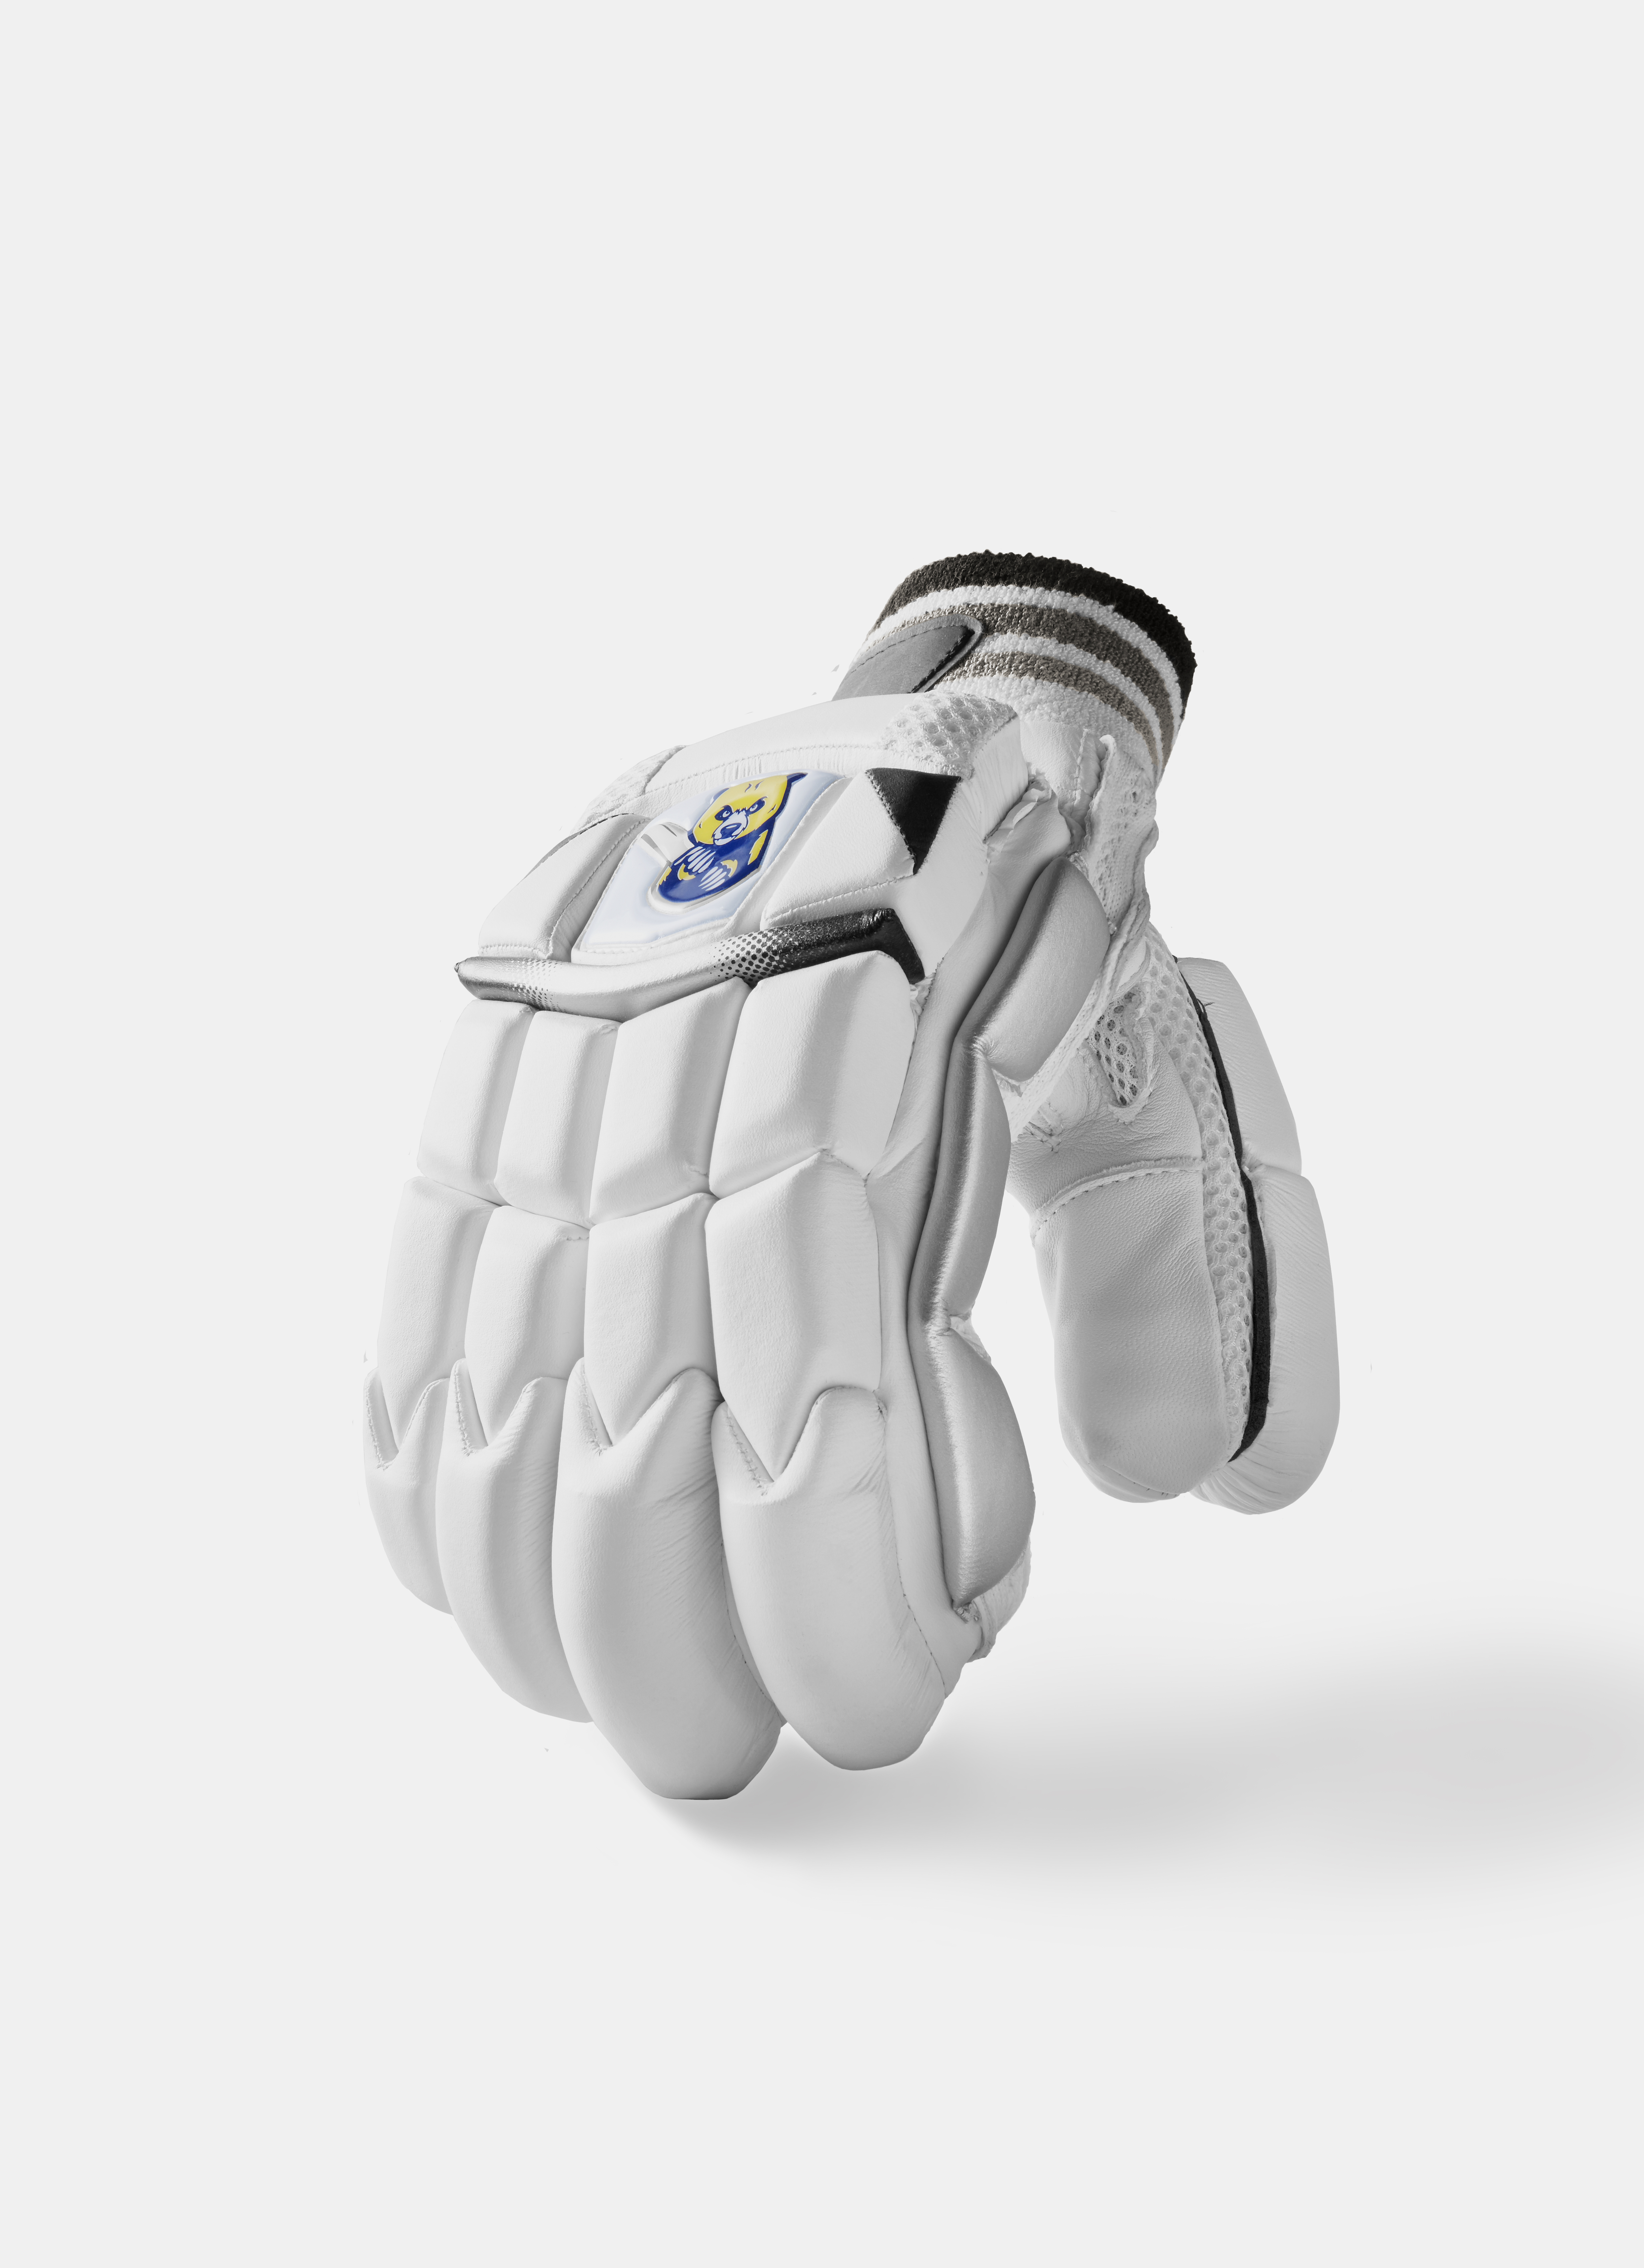 2019 Batting Gloves